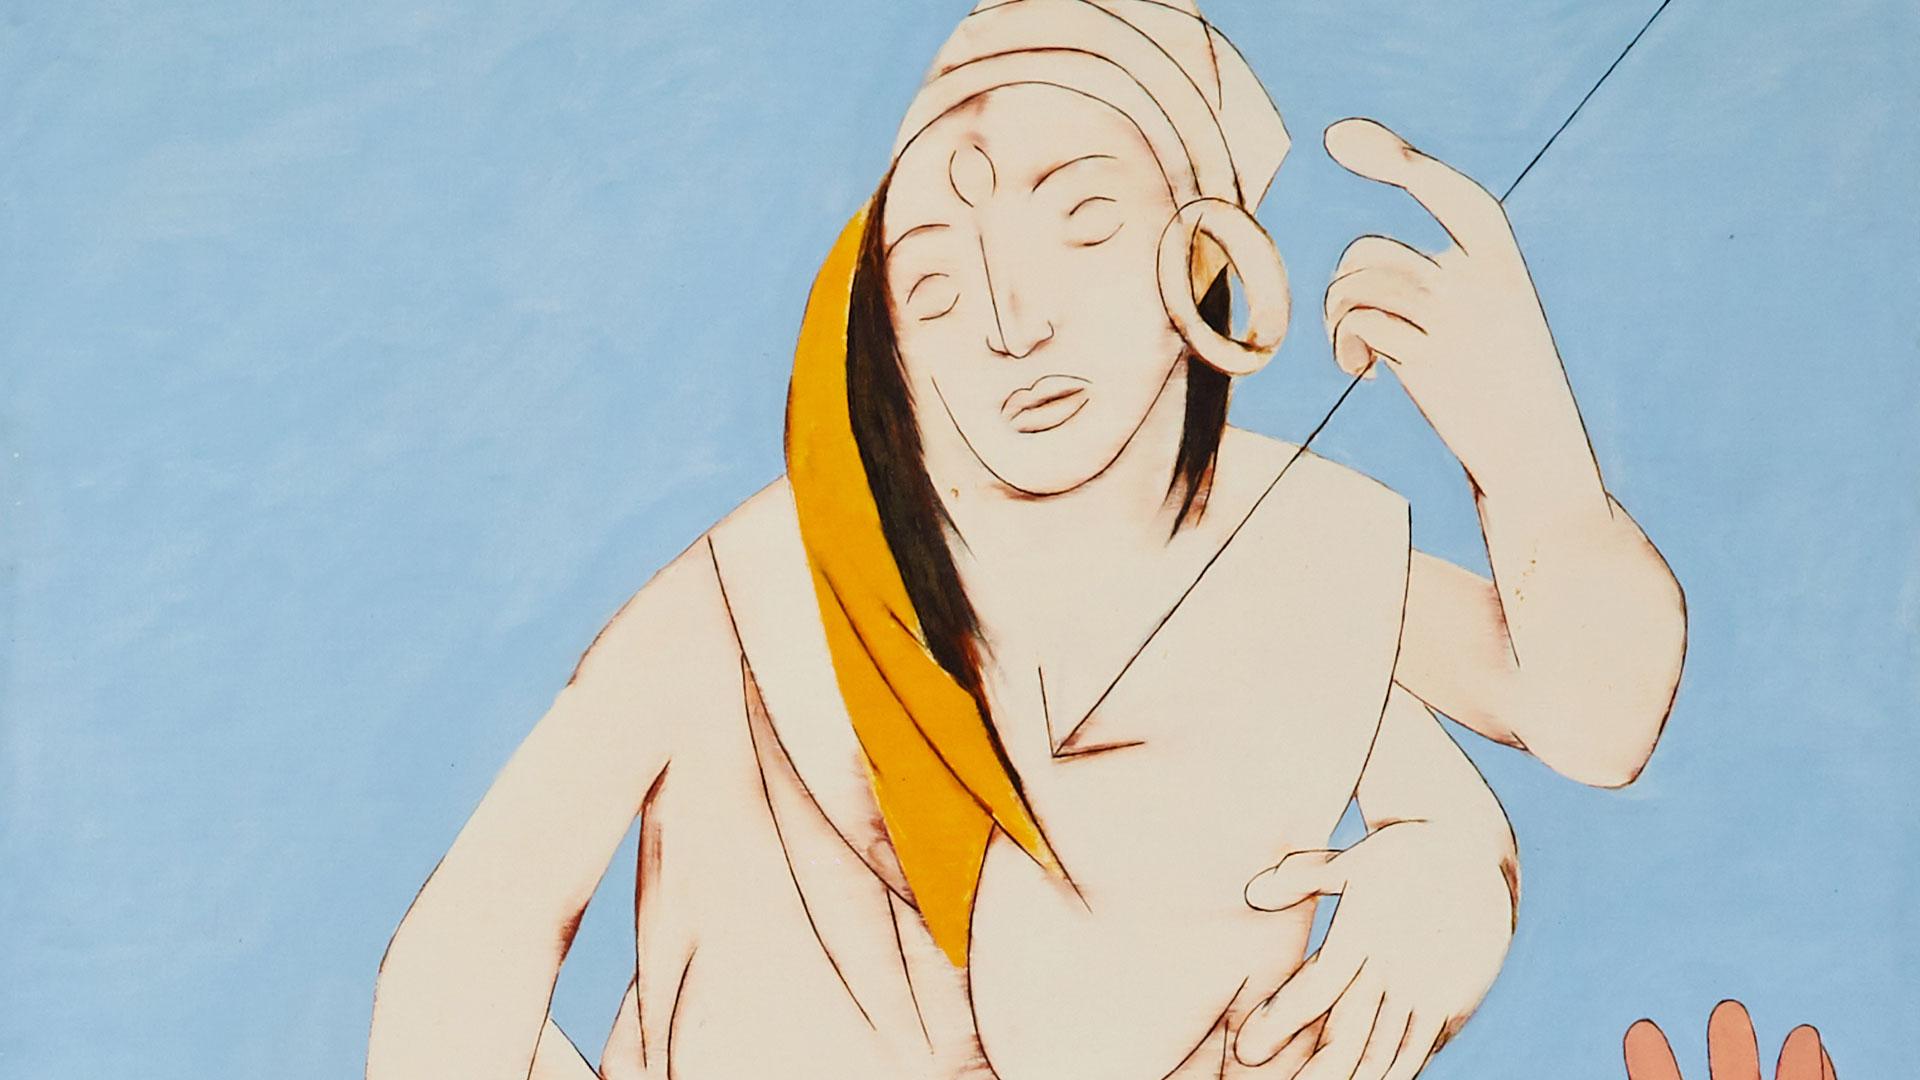 Durga Mahishasura Mardini del artista tyeb Mehta (Foto. Sotheby's)